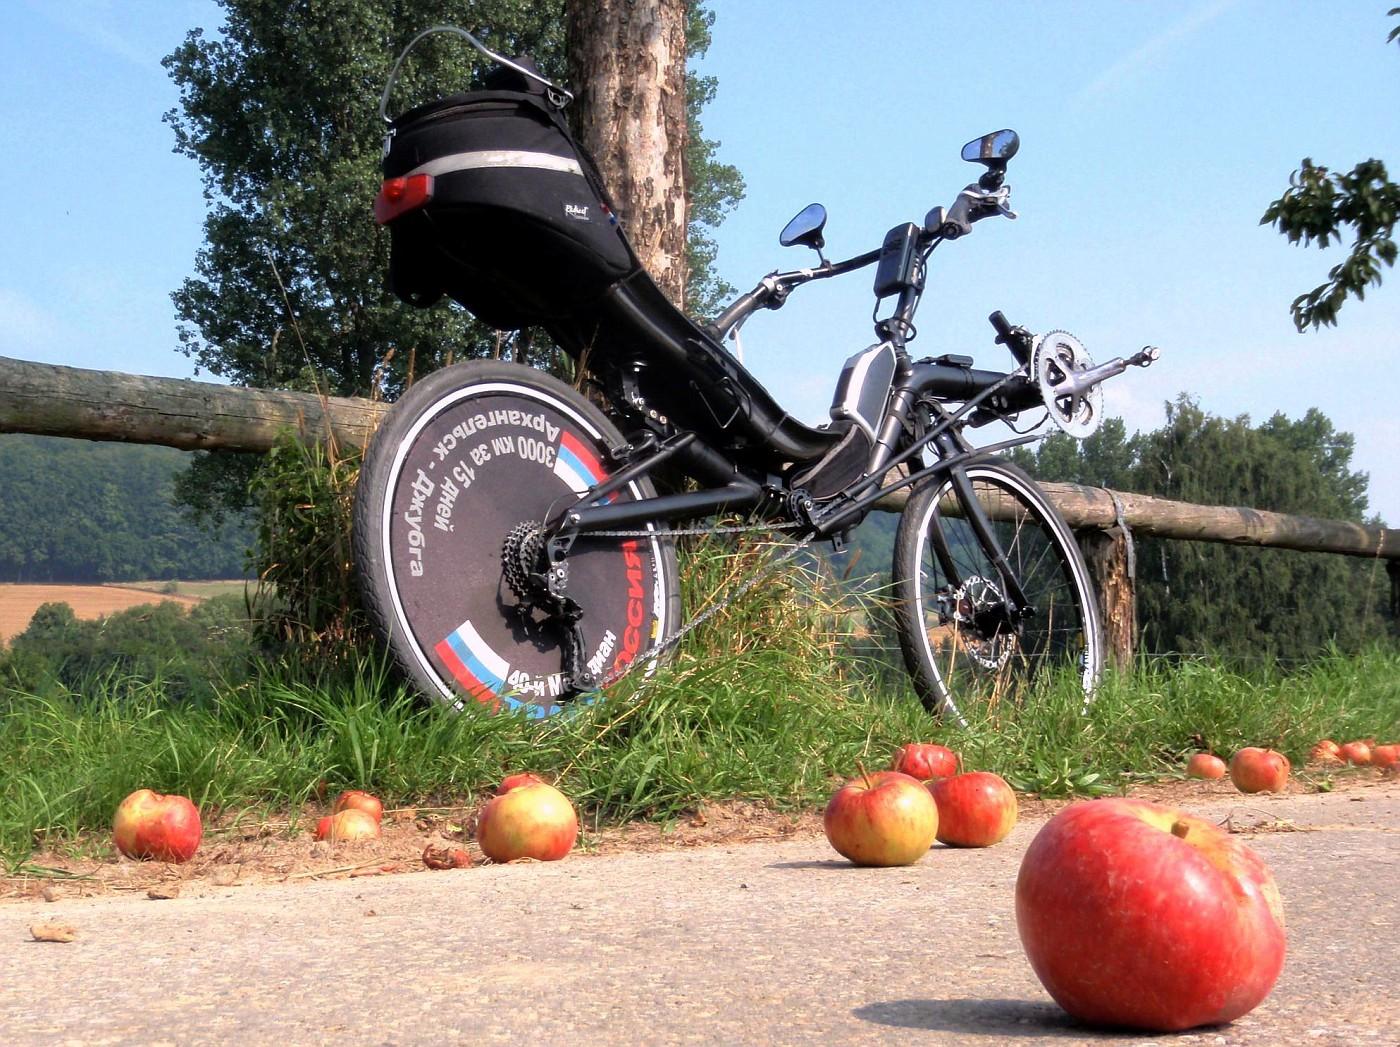 Apfel-Pause